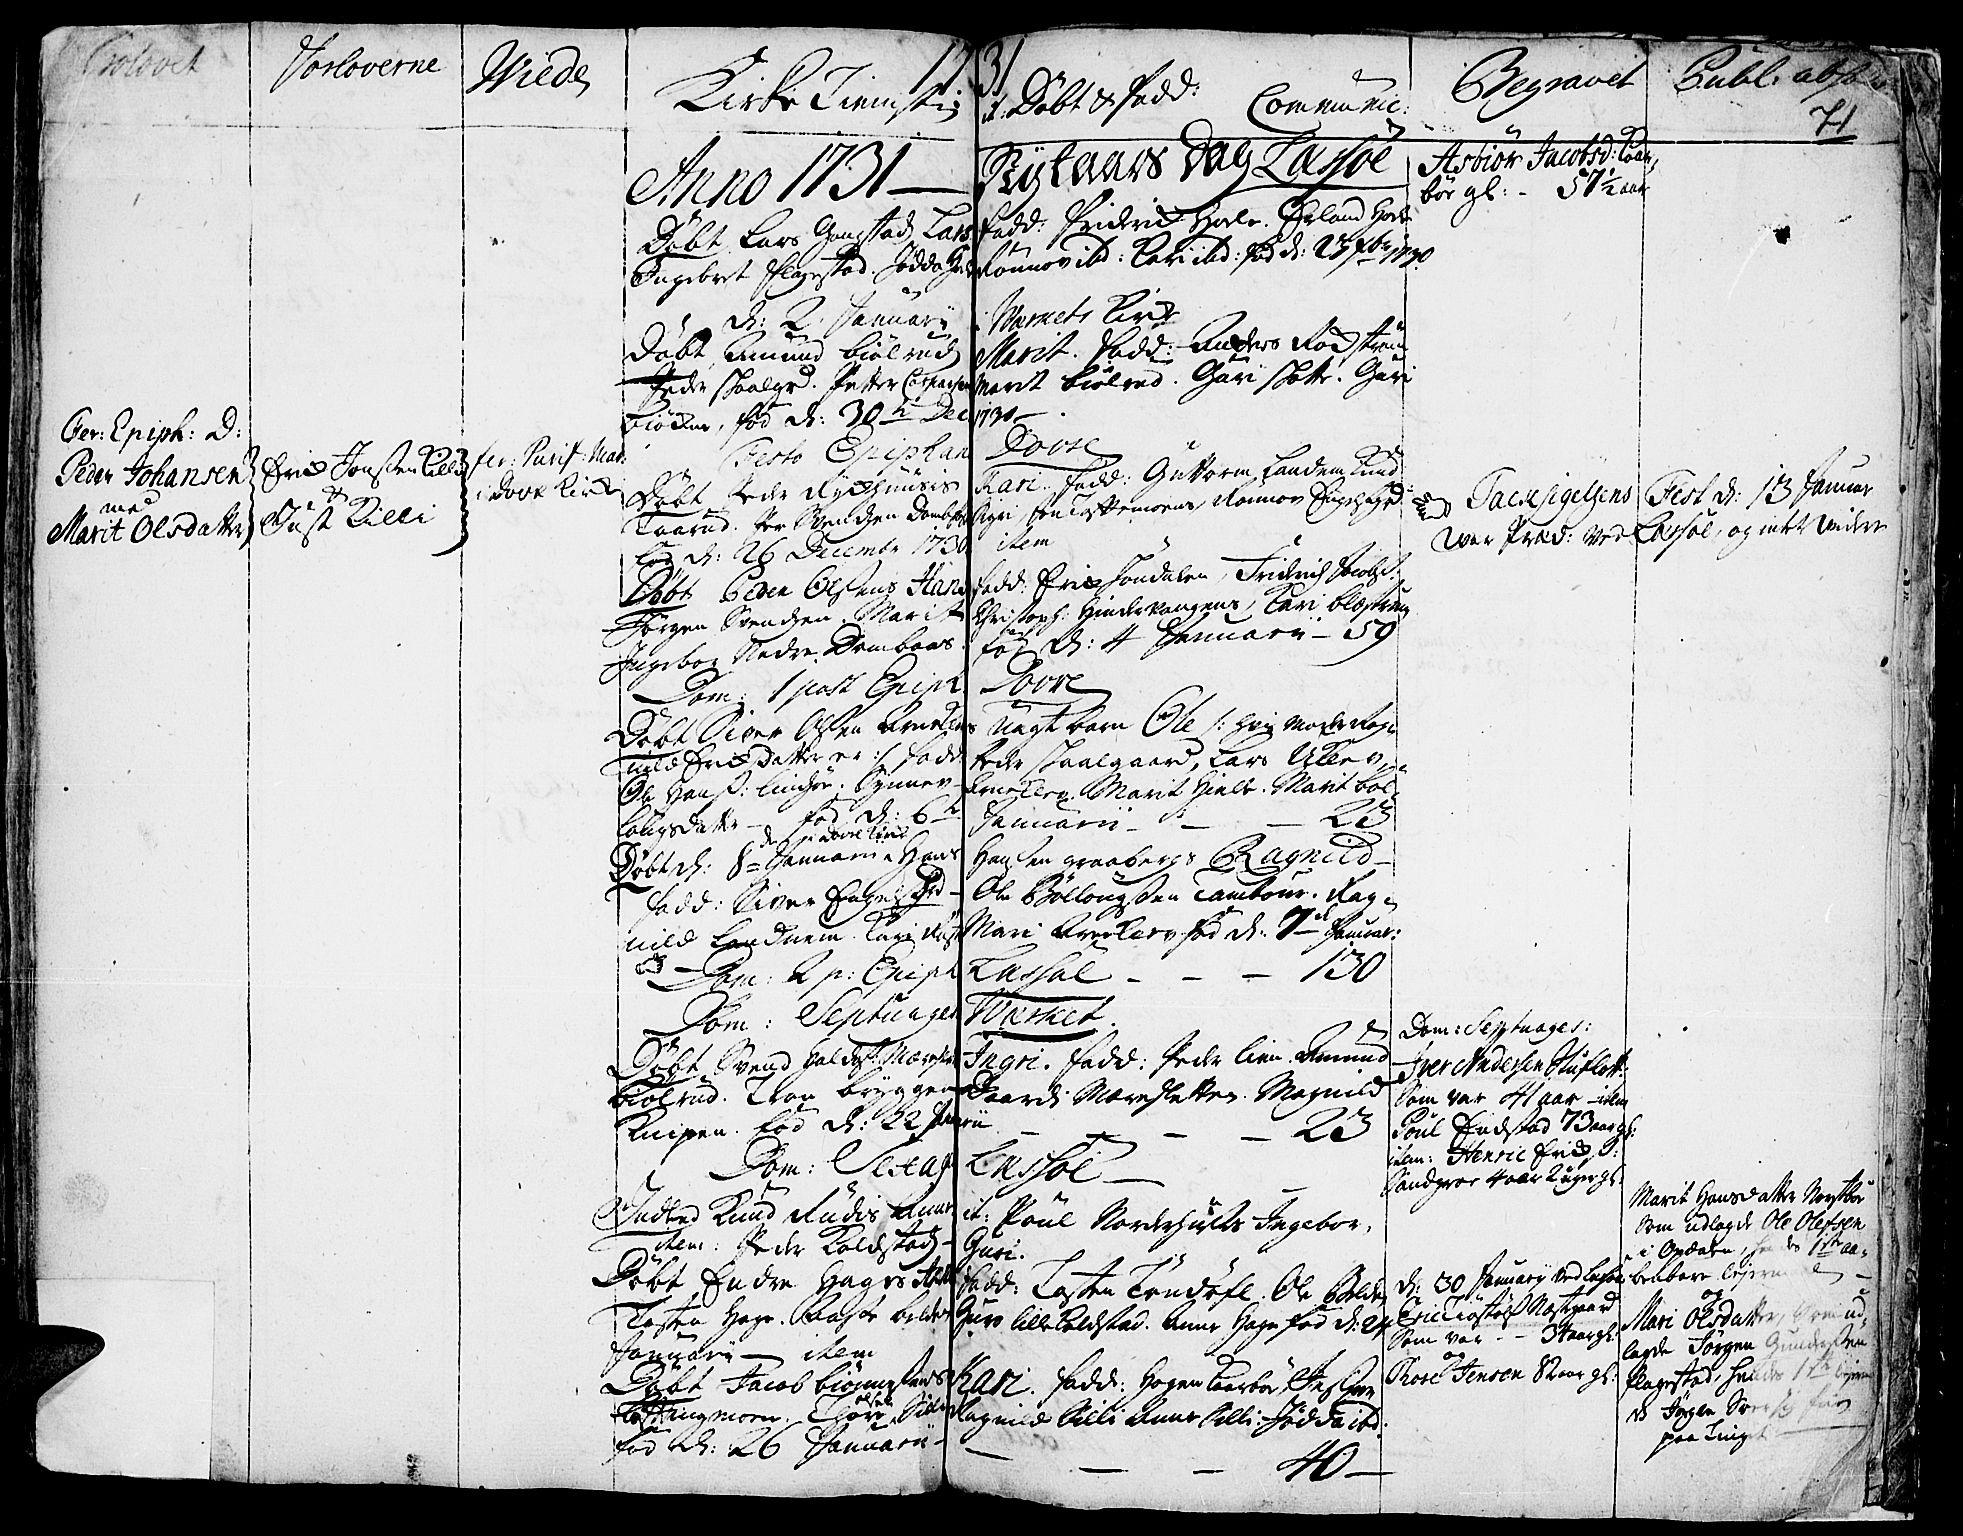 SAH, Lesja prestekontor, Ministerialbok nr. 1, 1724-1731, s. 71